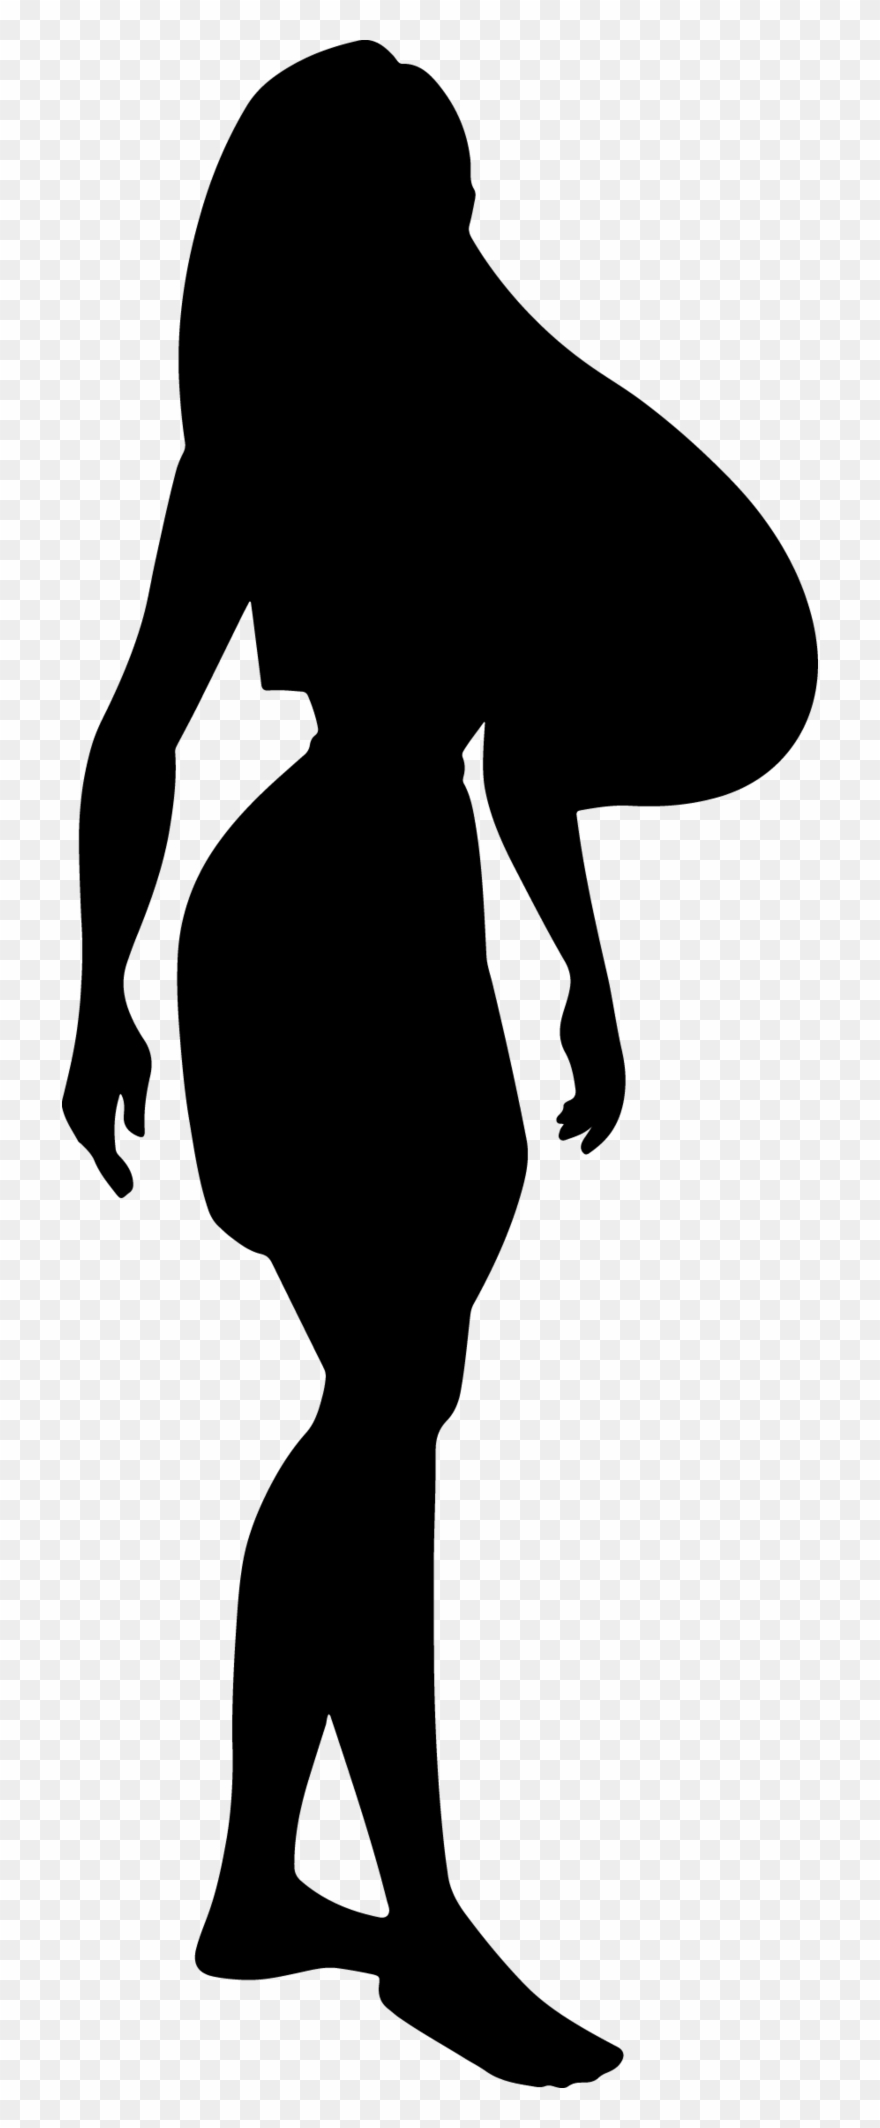 photograph regarding Free Printable Disney Silhouettes identified as Disney Princess Silhouette No cost Printables - Disney Princess